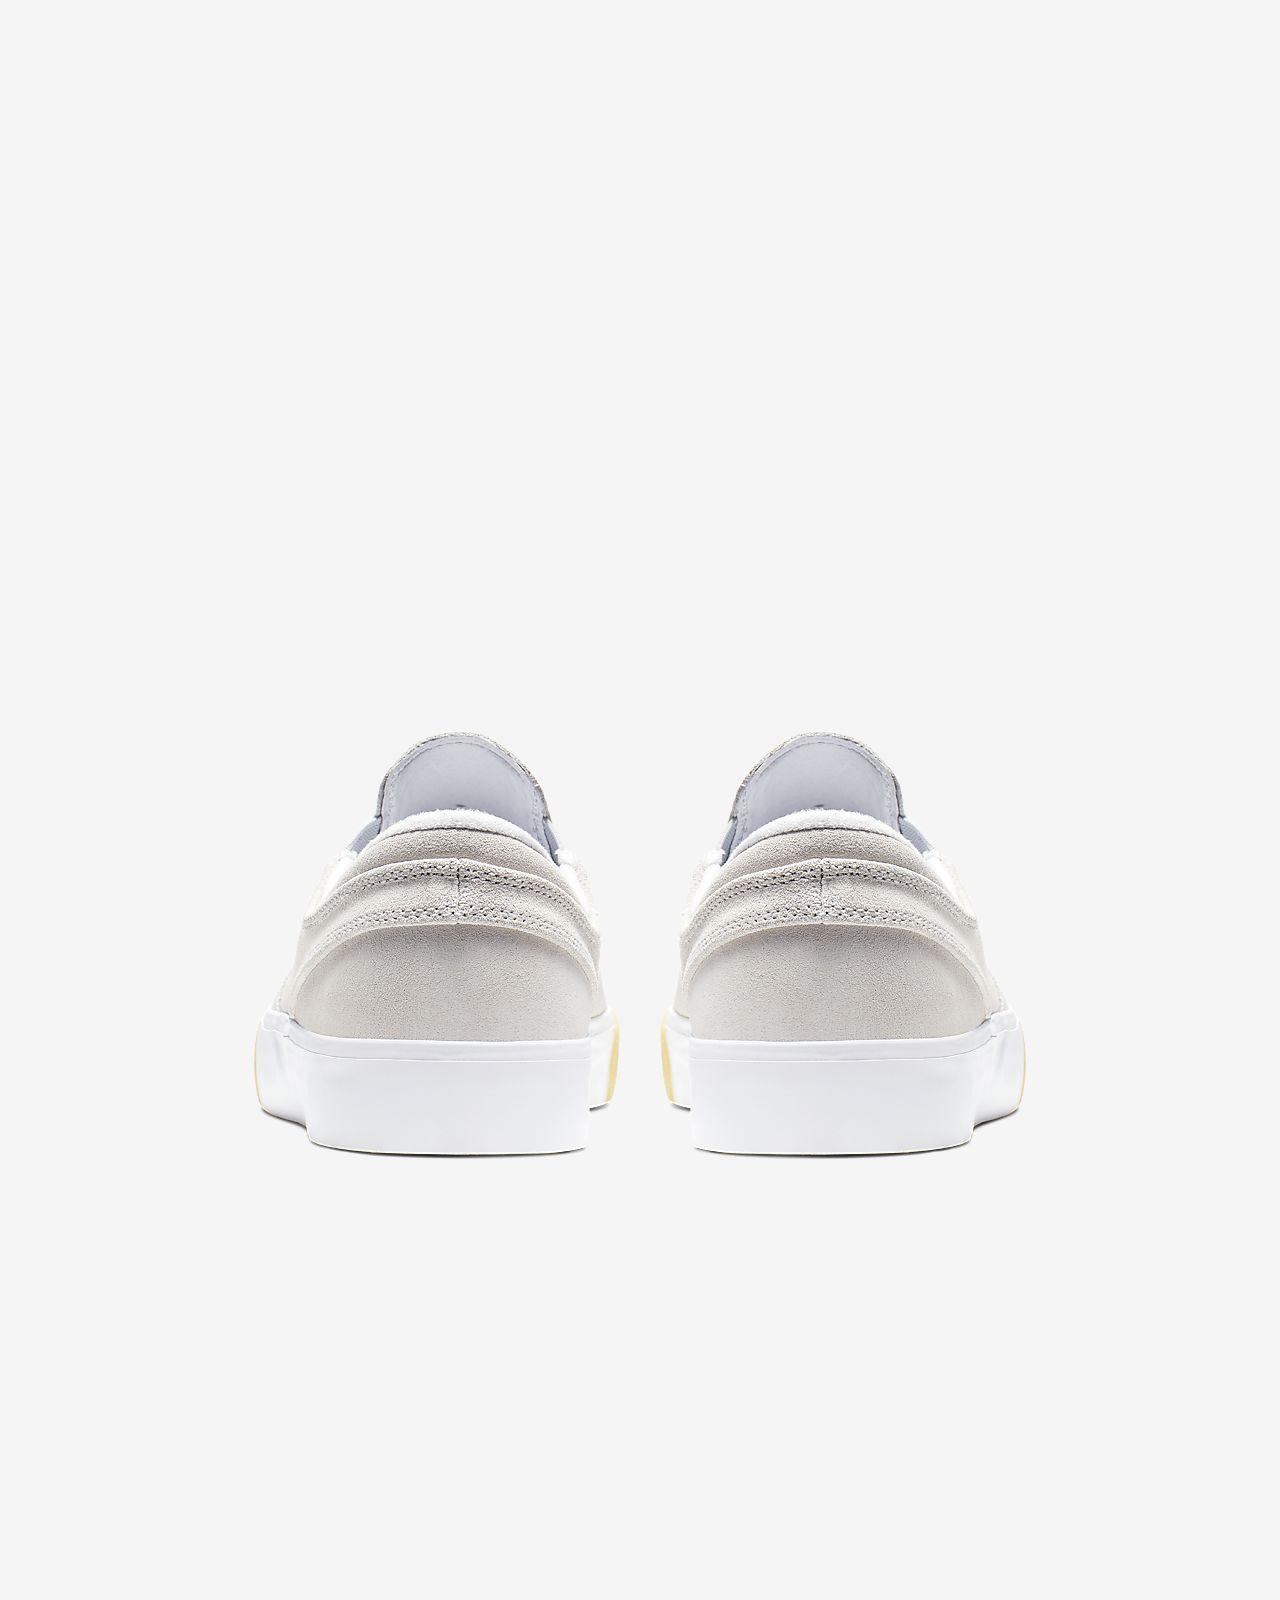 uk availability a326f 1c17b ... Nike SB Zoom Janoski Slip RM SE Skate Shoe